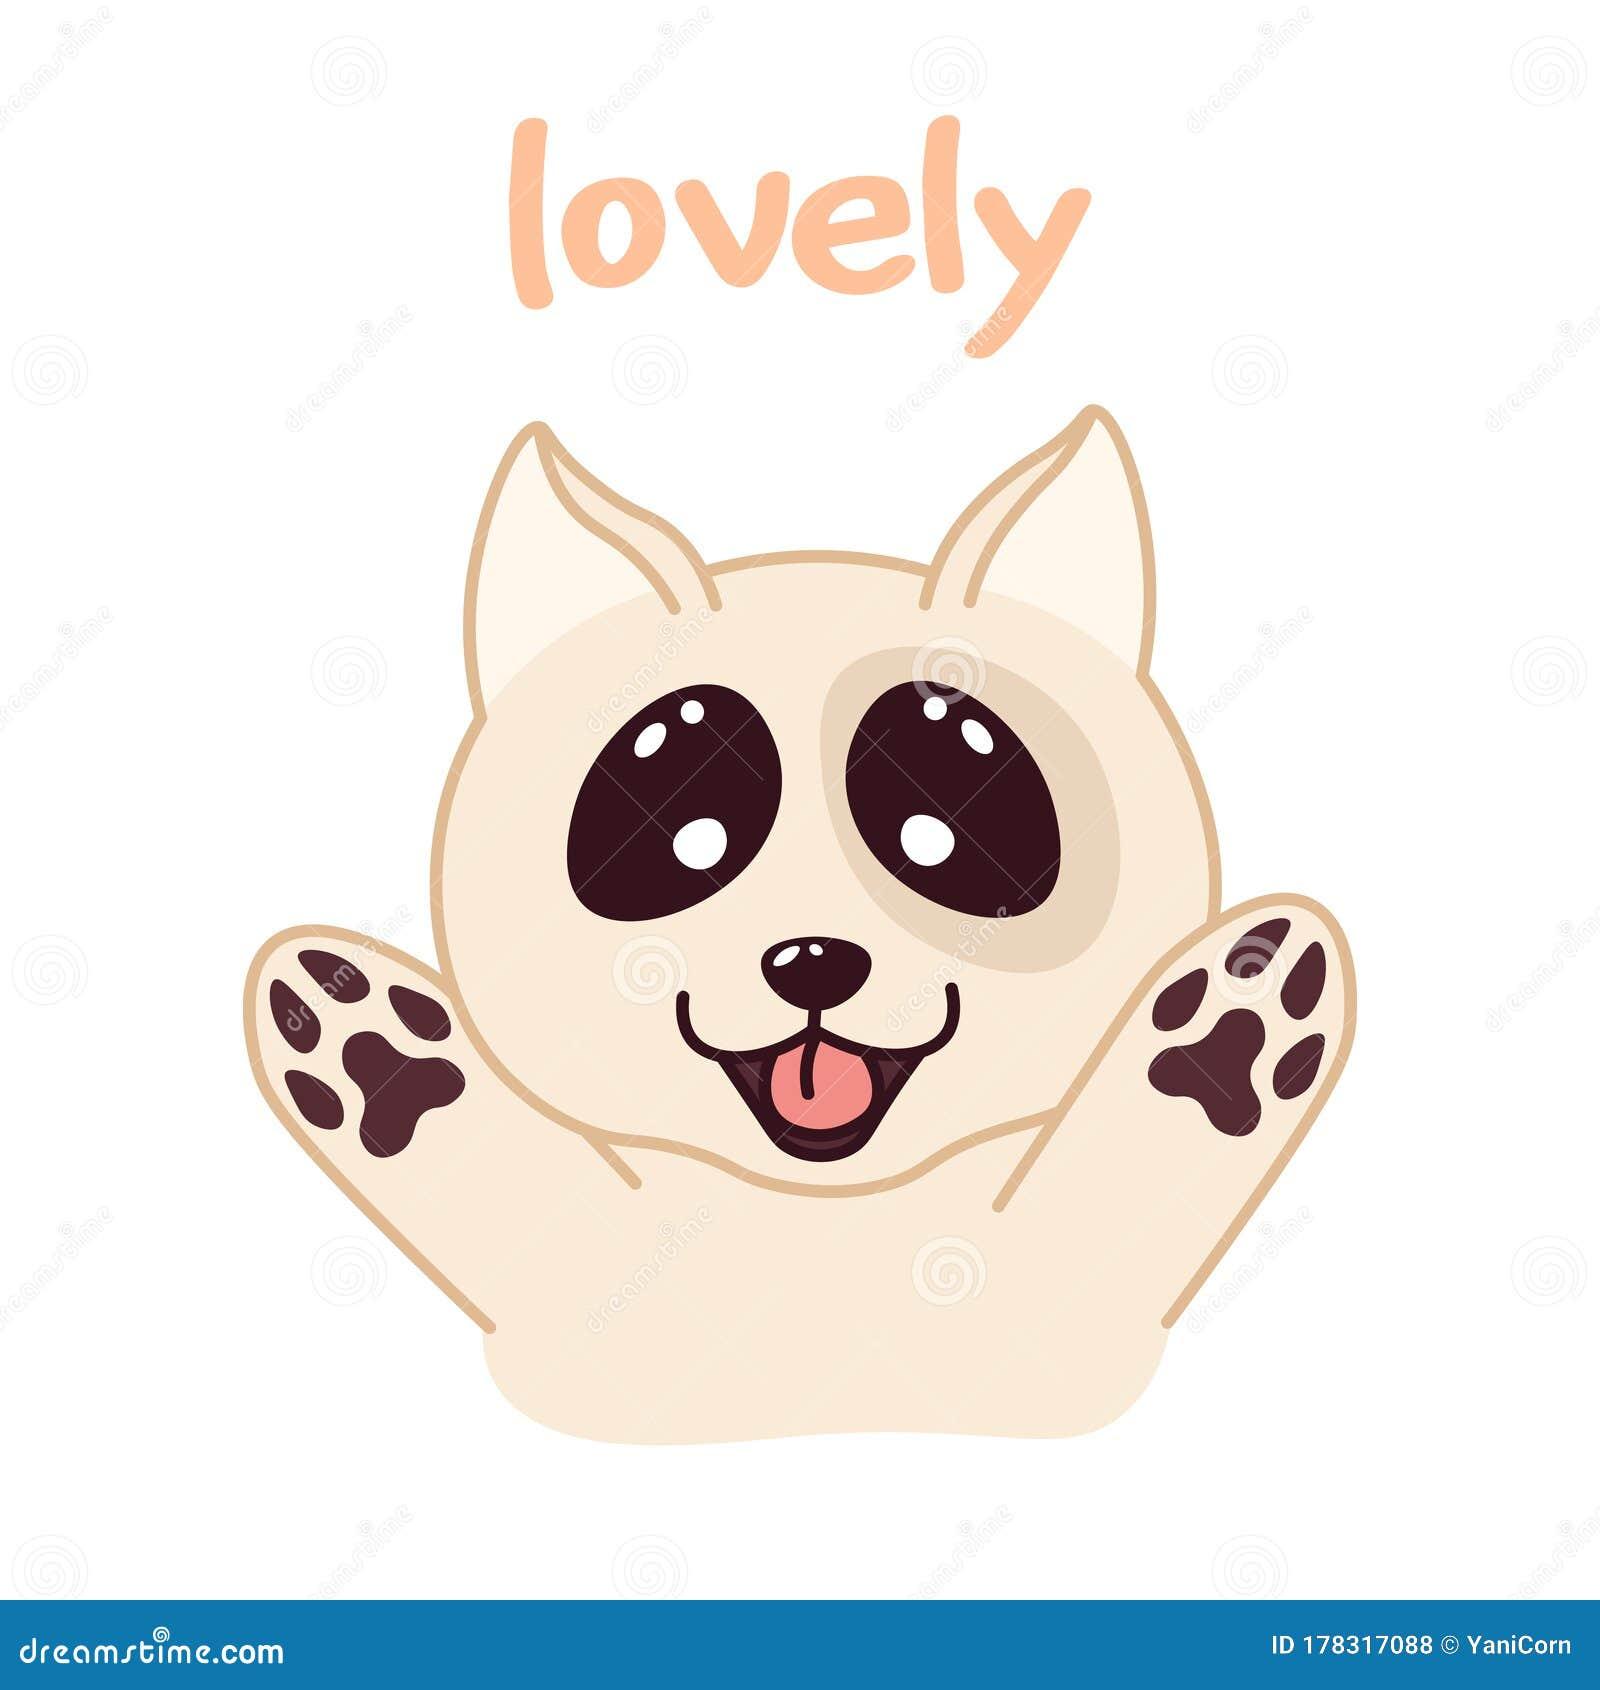 Kawaii Doodle Dog Cute Domestic Animal Lovely Cartoon Drawing